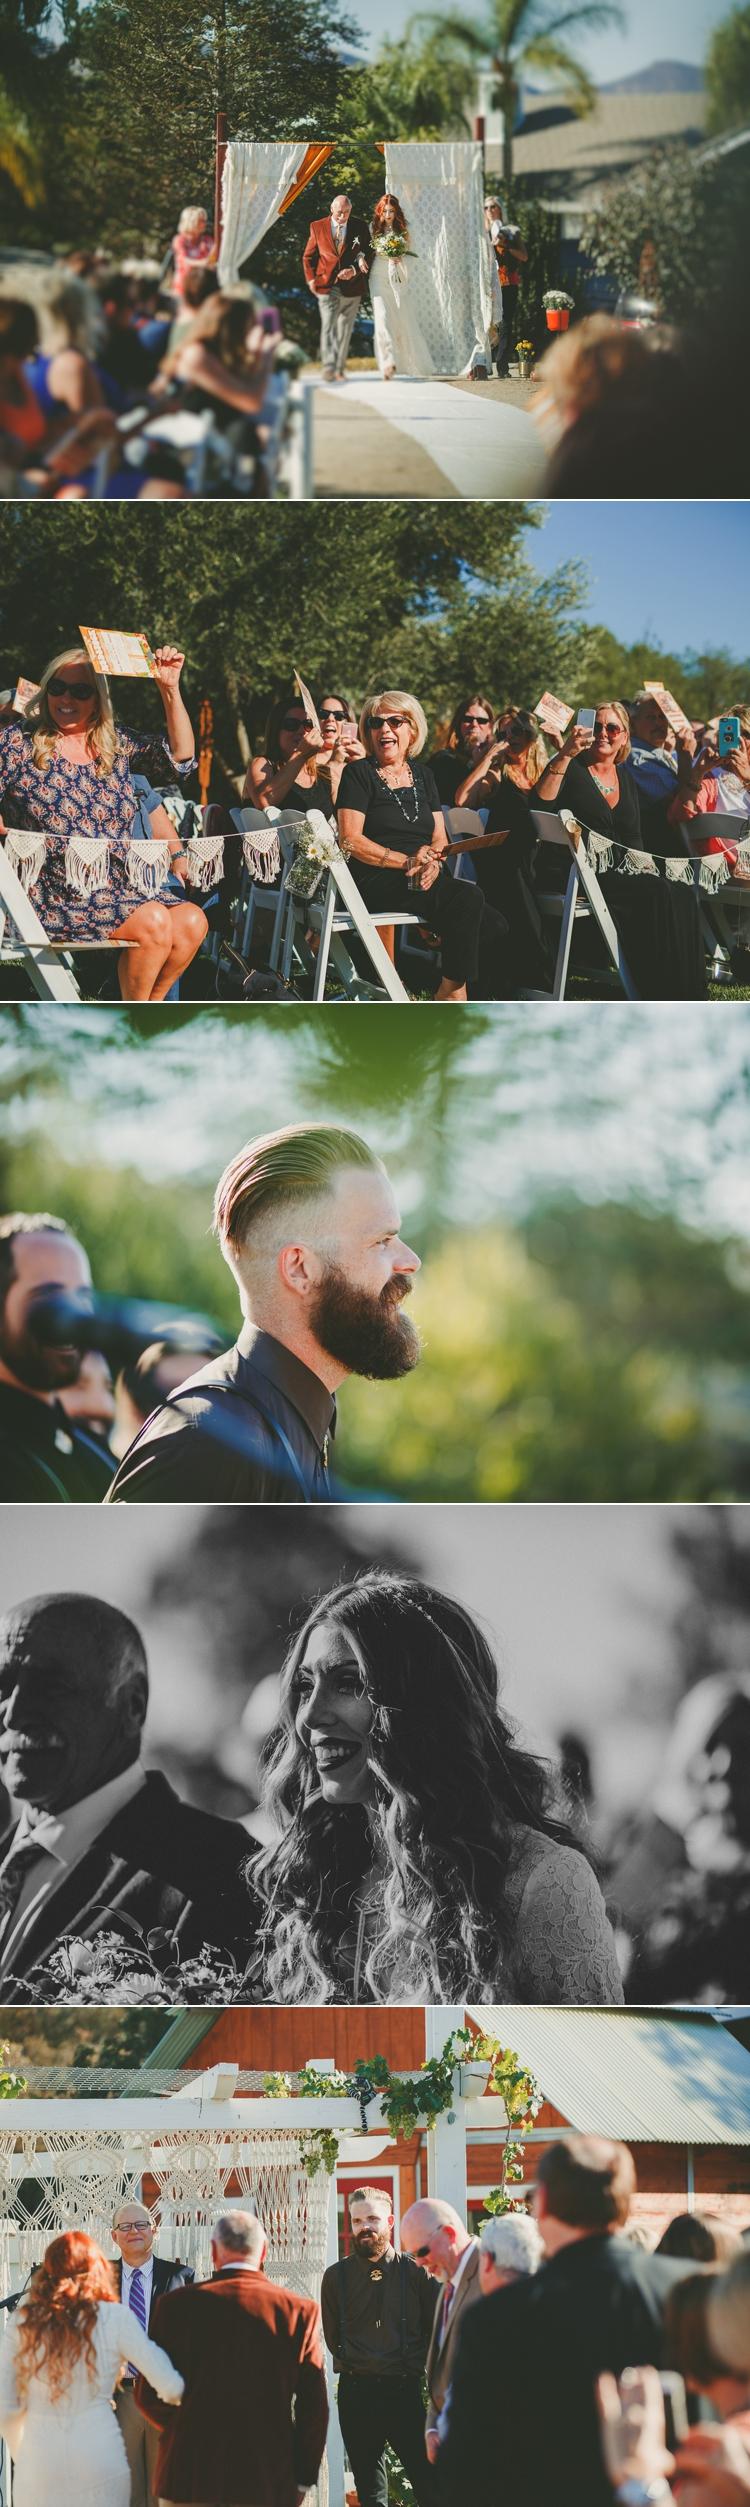 woodstock-inspired-wedding-photos-12